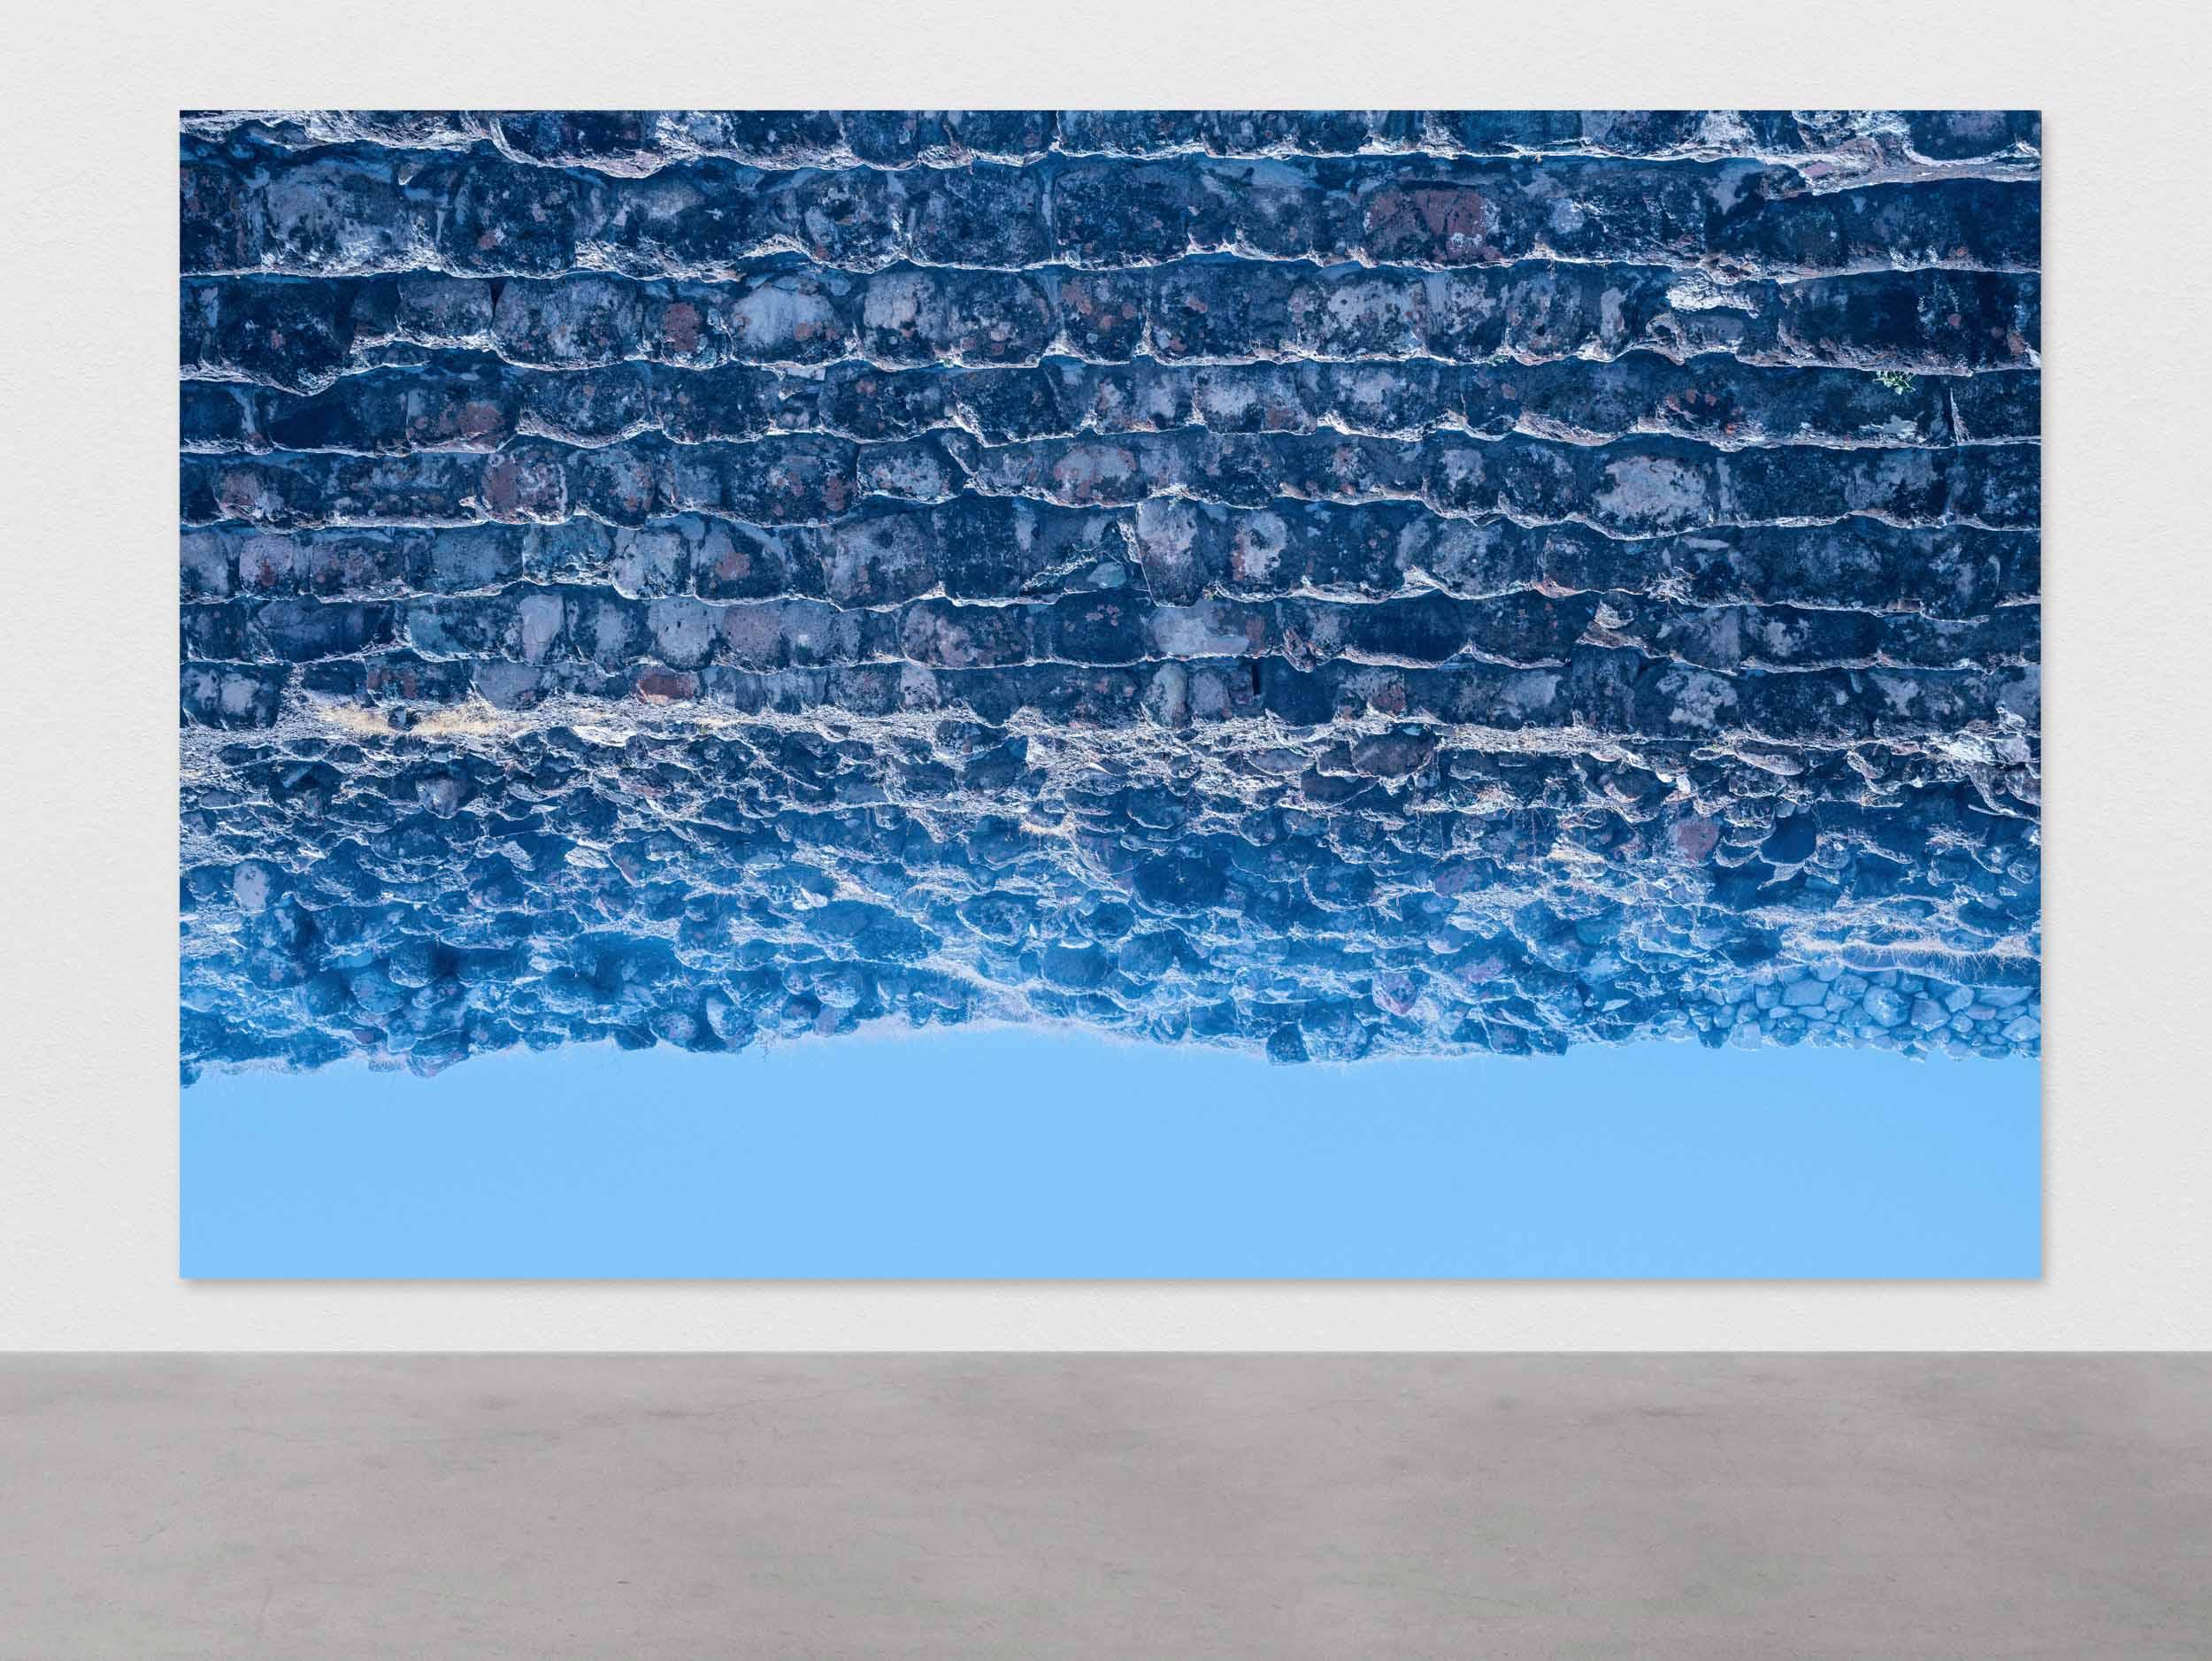 montagne bleu.jpg